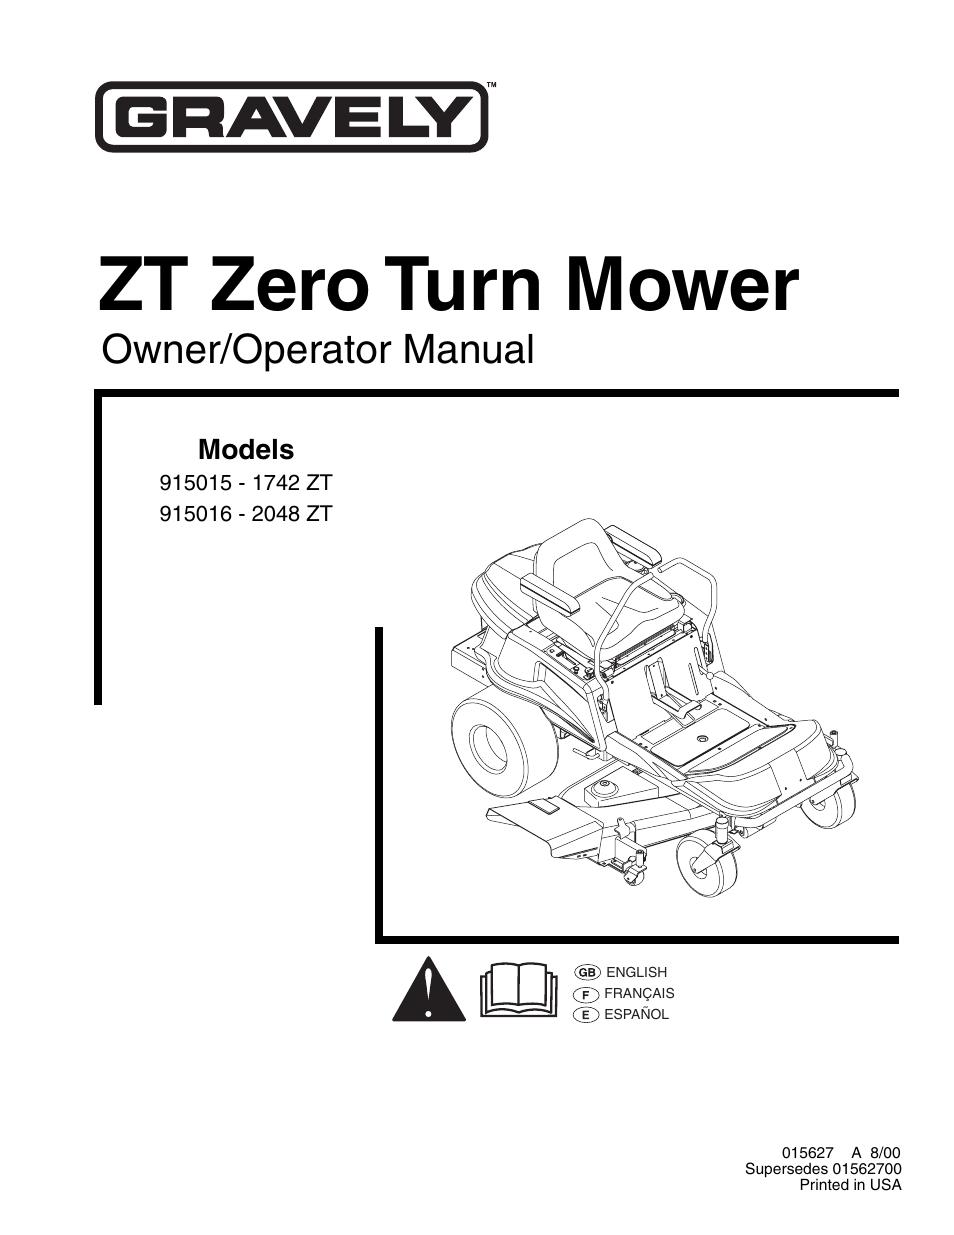 gravely zero turn mower manual